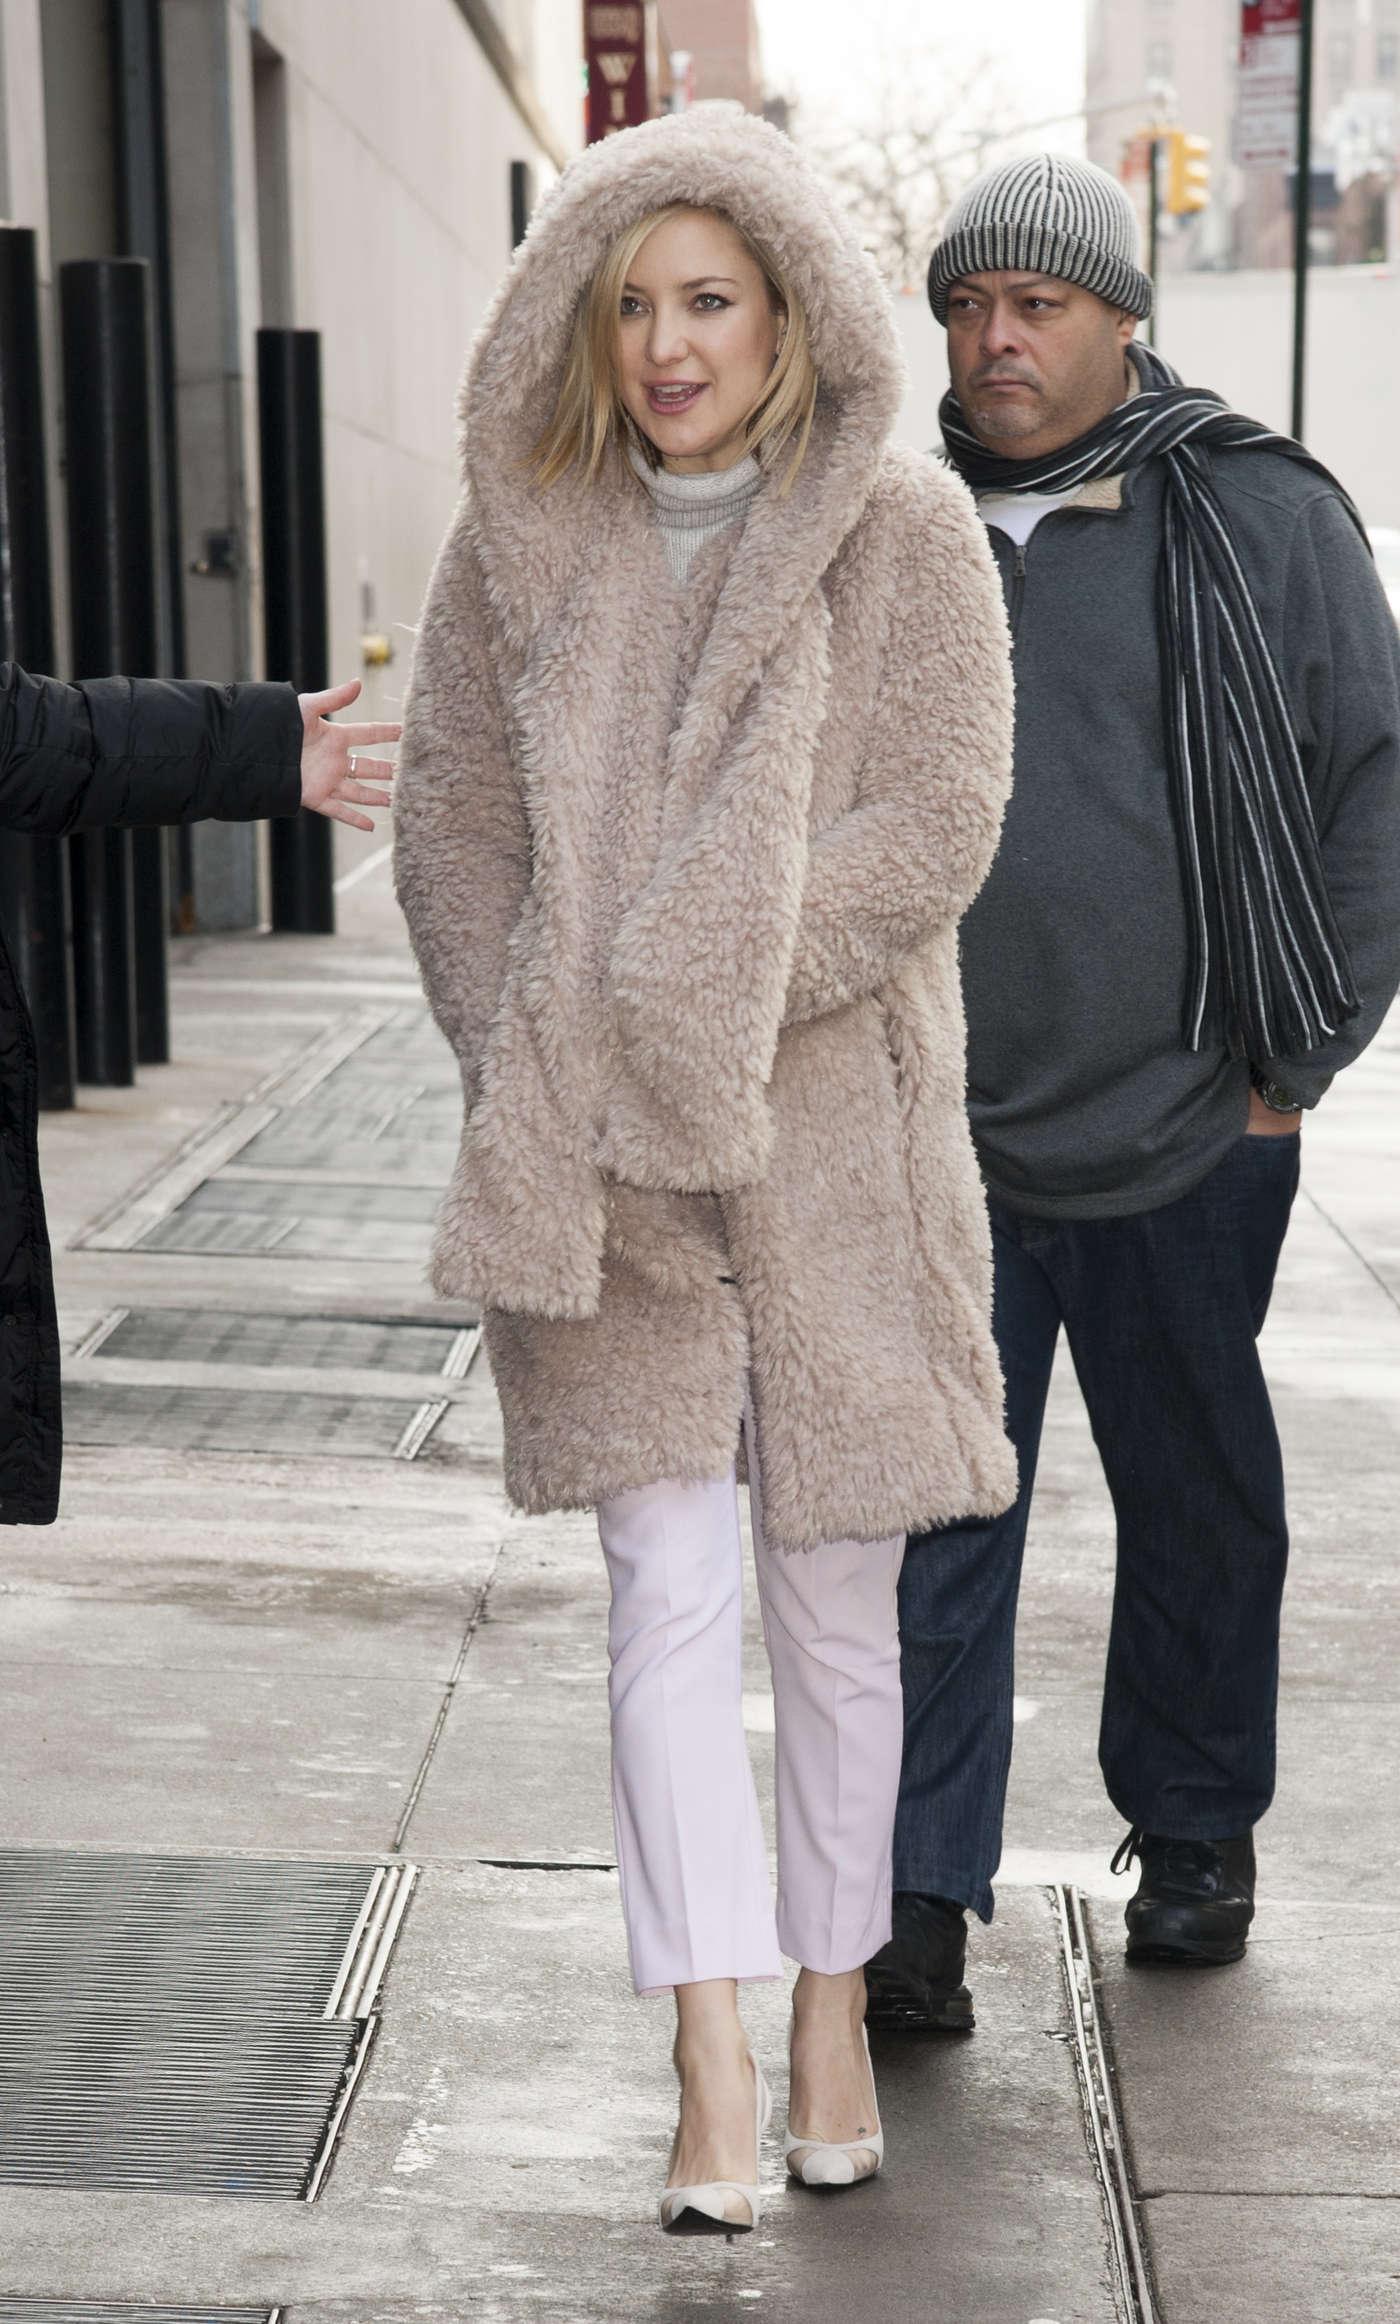 Kate Hudson Arrives to Regal Cinema 13 for 'Kung-Fu Panda 3' Screening in New York